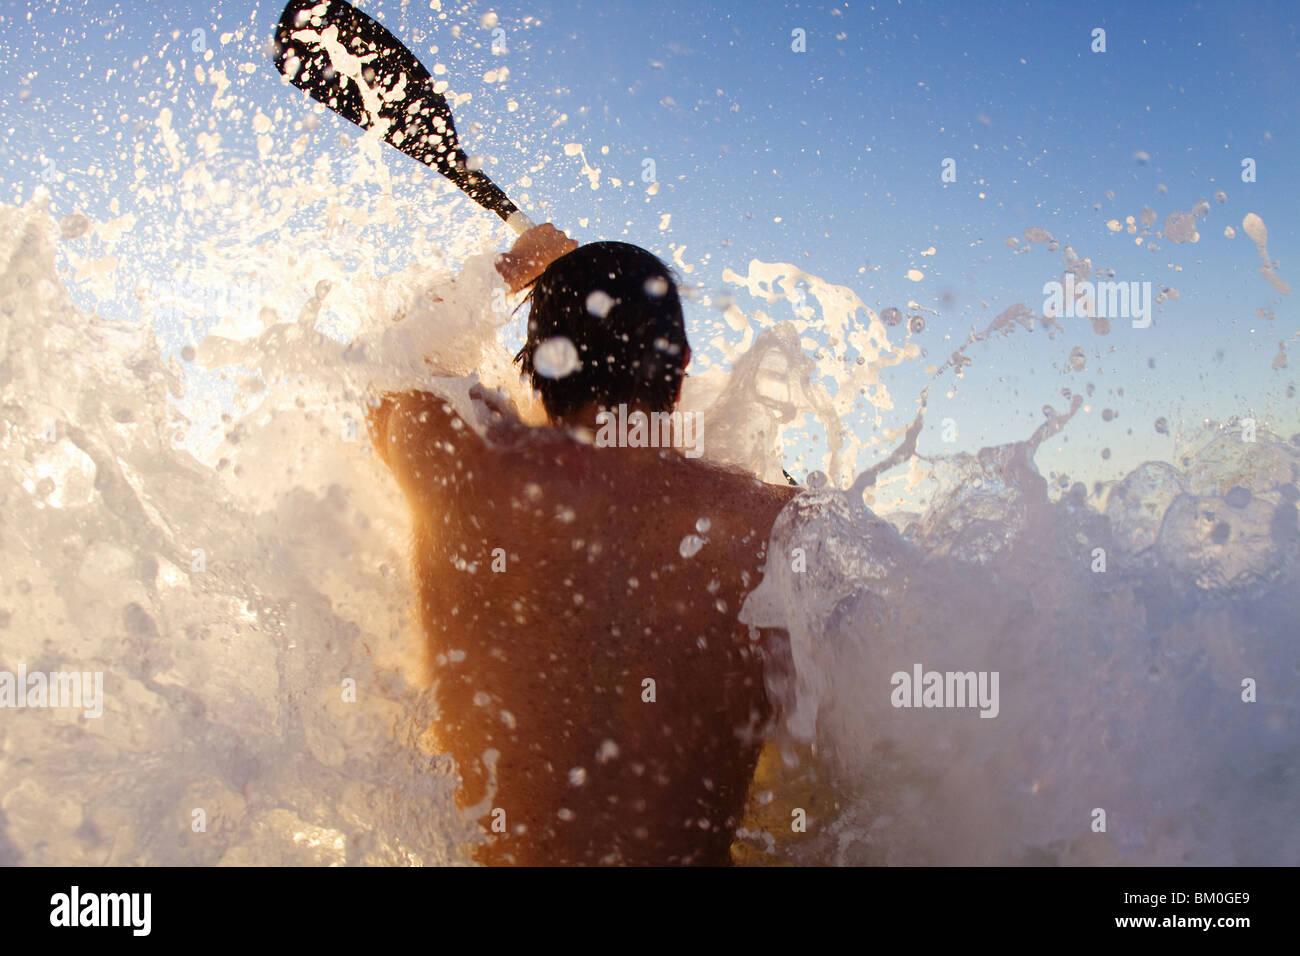 Junger Mann Kajak auf hohe Welle, Sun Coast Beach, Durban, Provinz KwaZulu-Natal, Südafrika Stockfoto